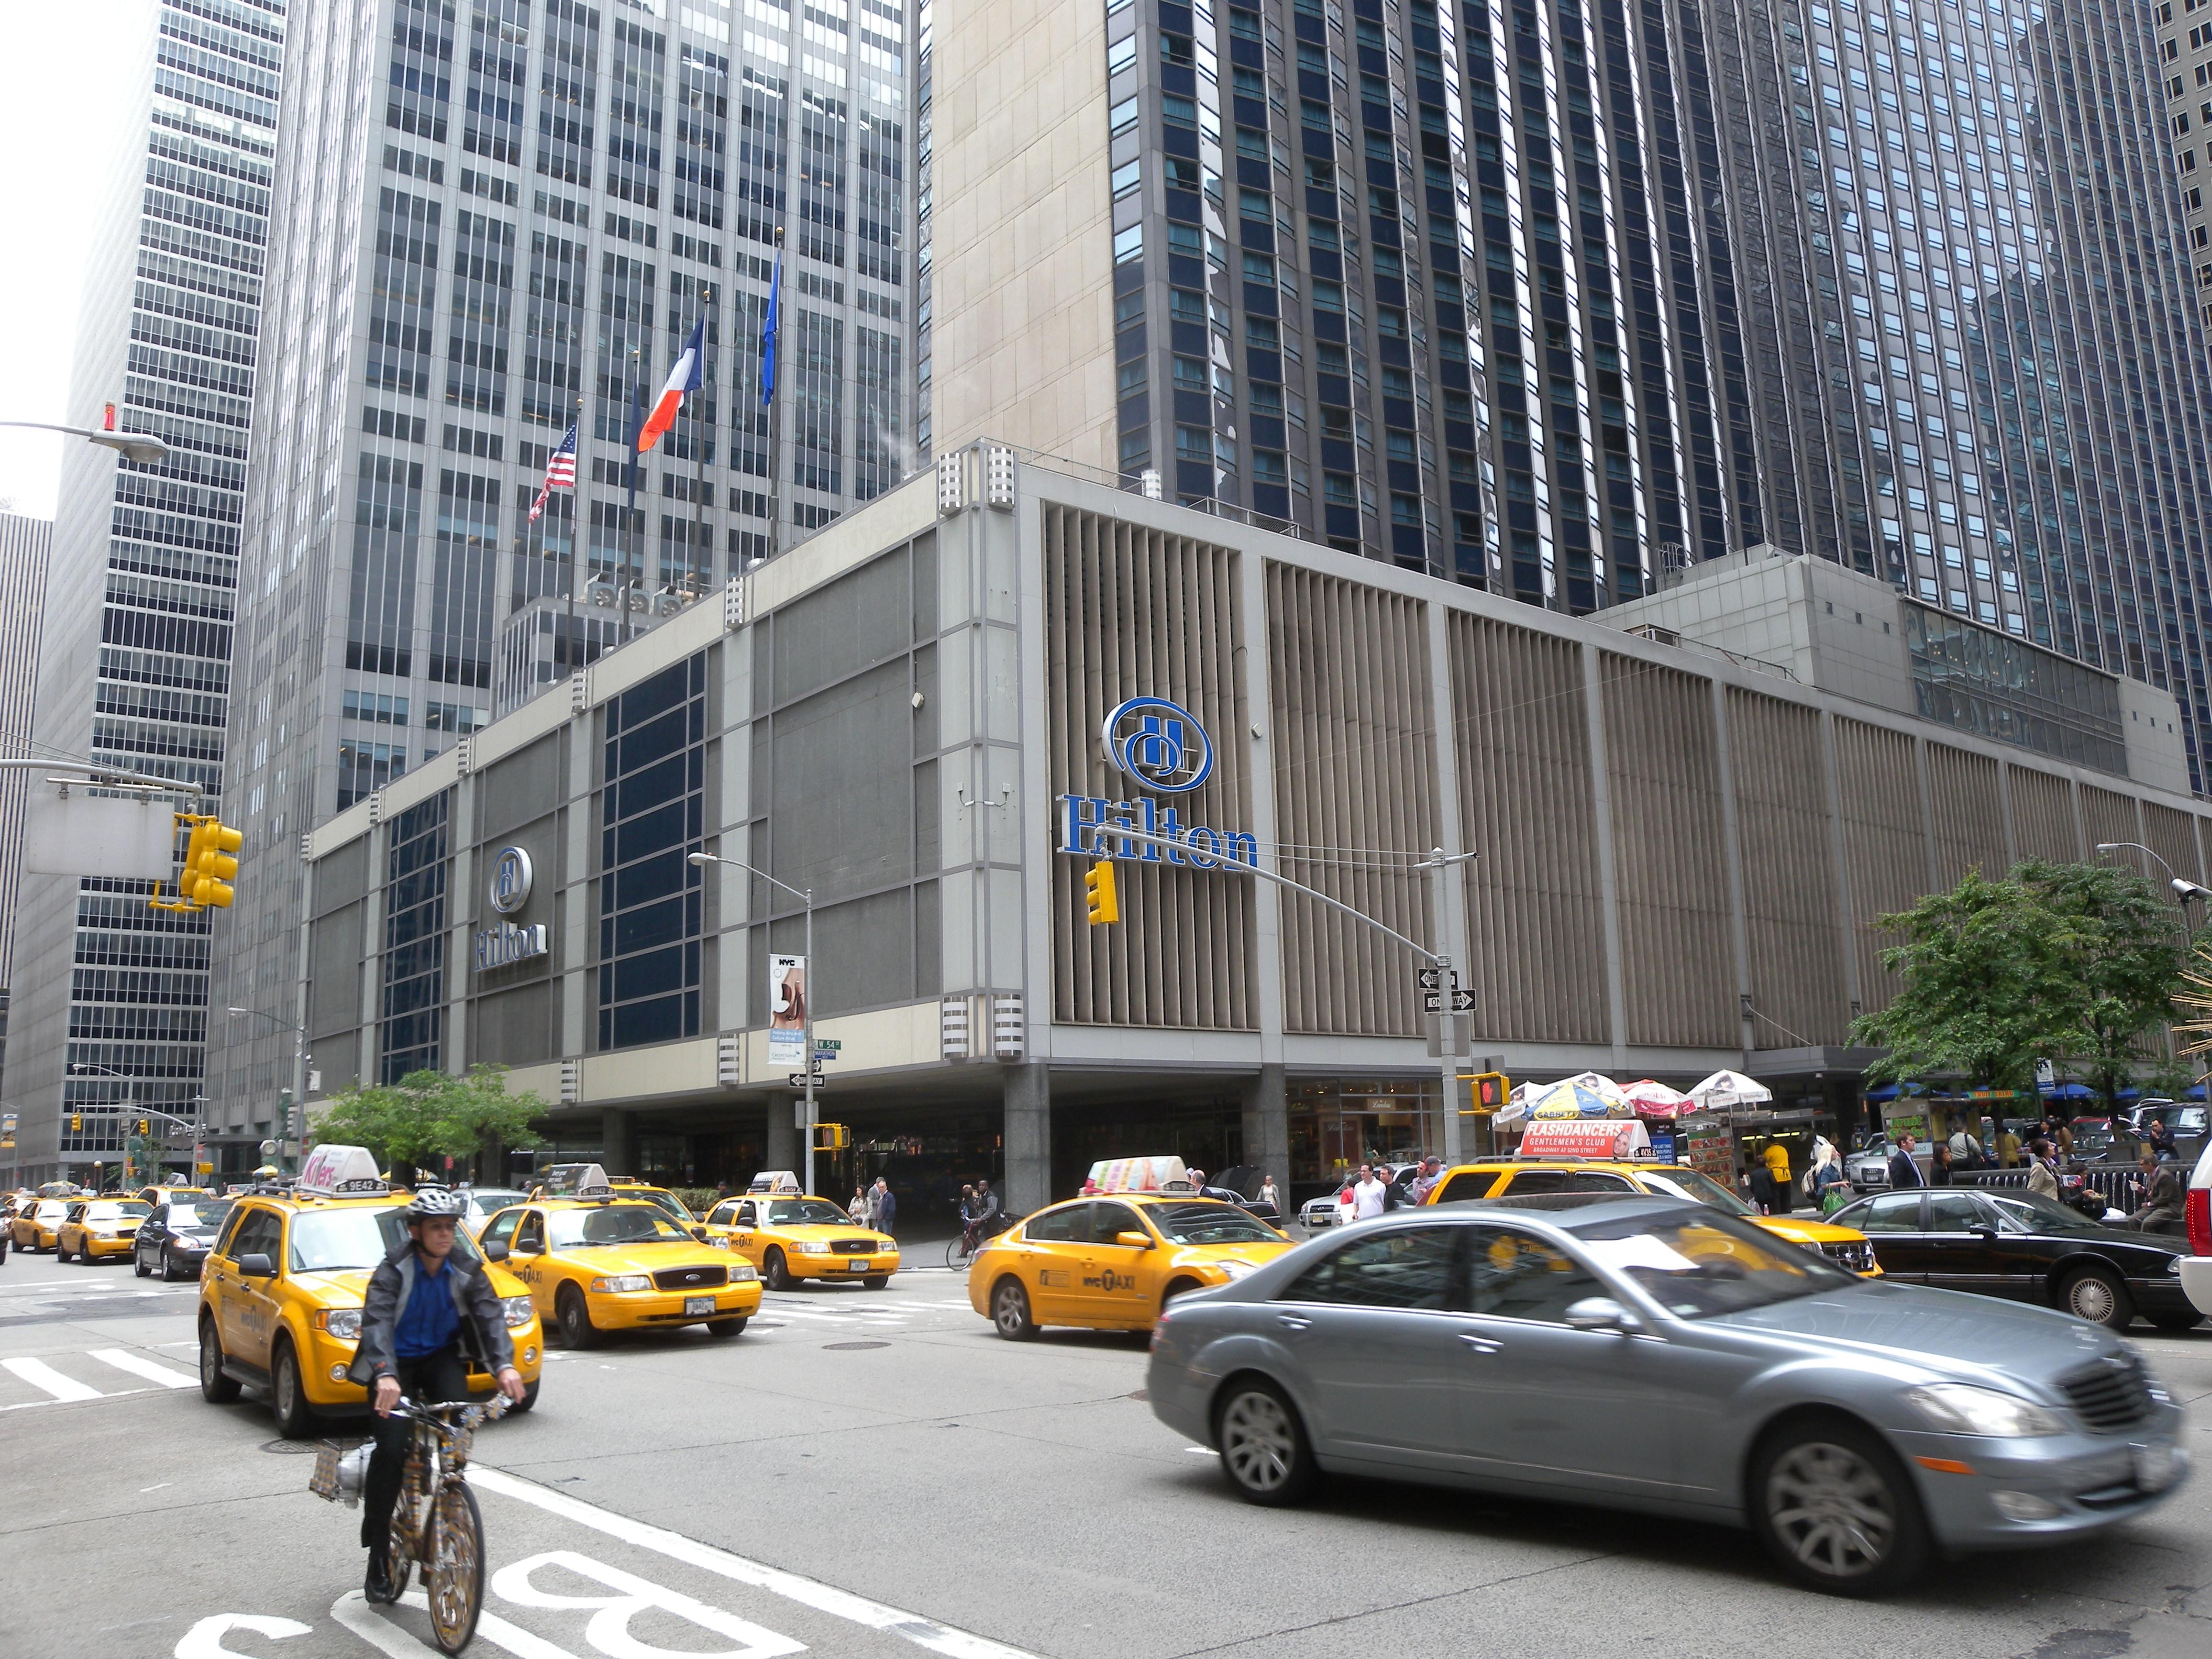 Hilton Hotel Midtown Nyc